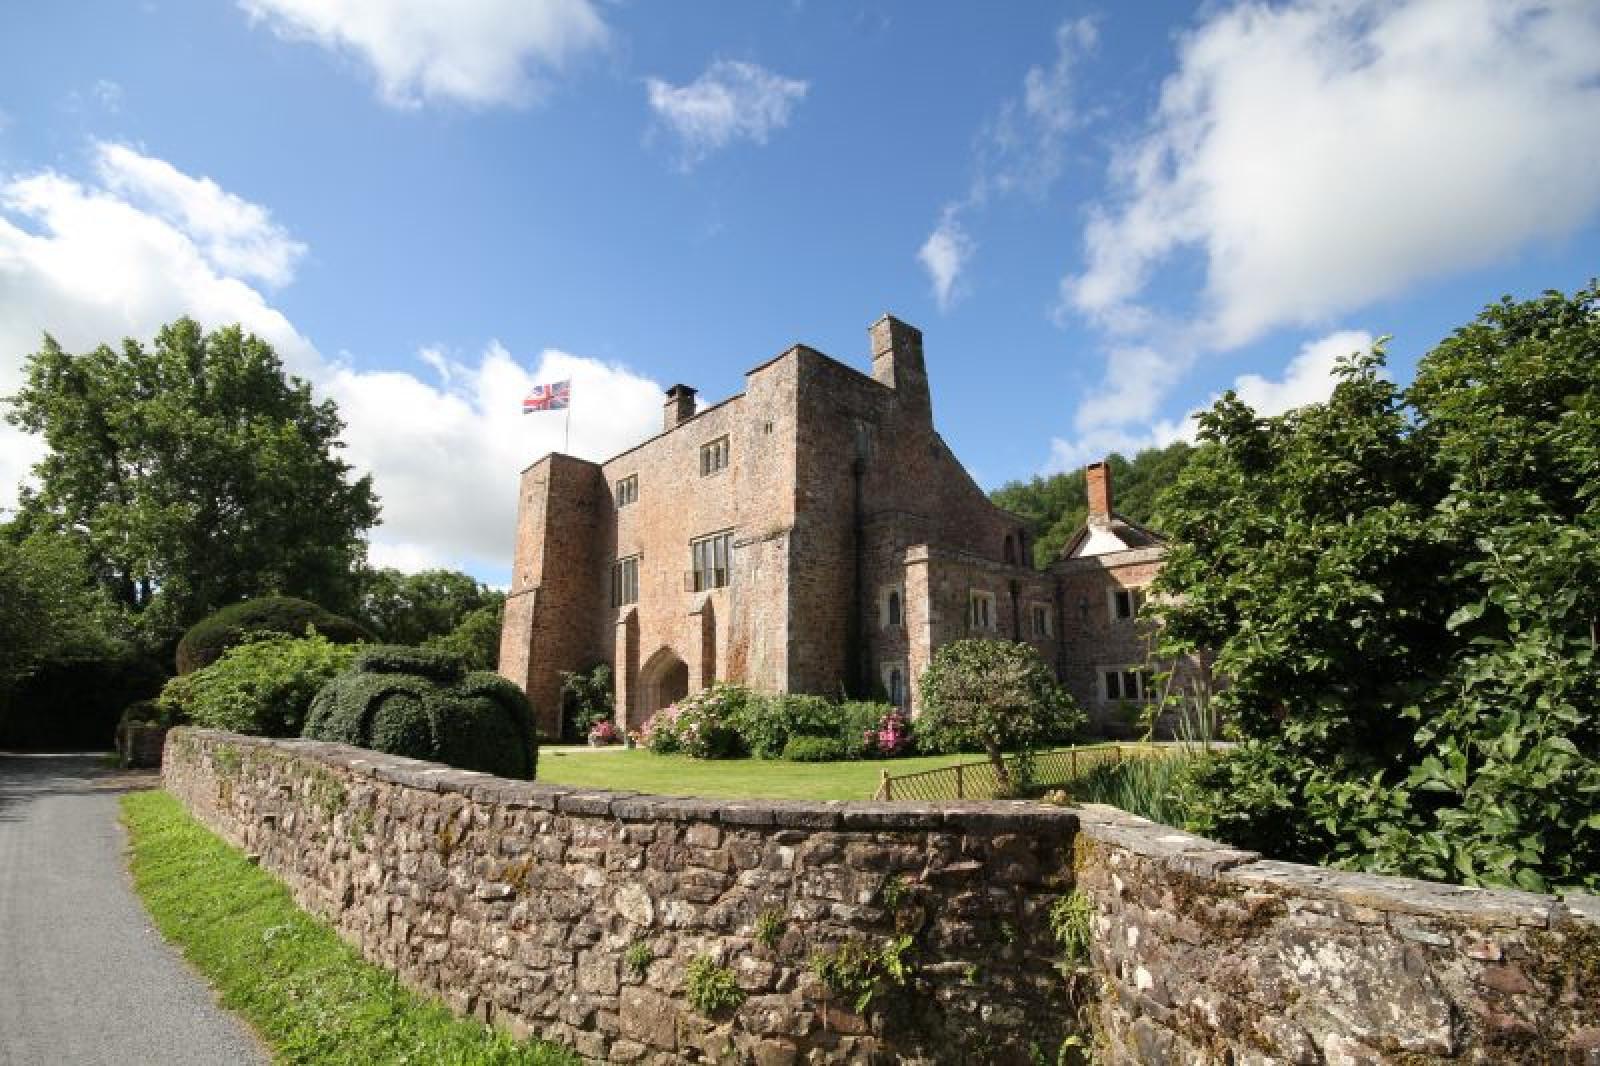 13 Amazing Castle Wedding Venues for a Fairytale Wedding ...